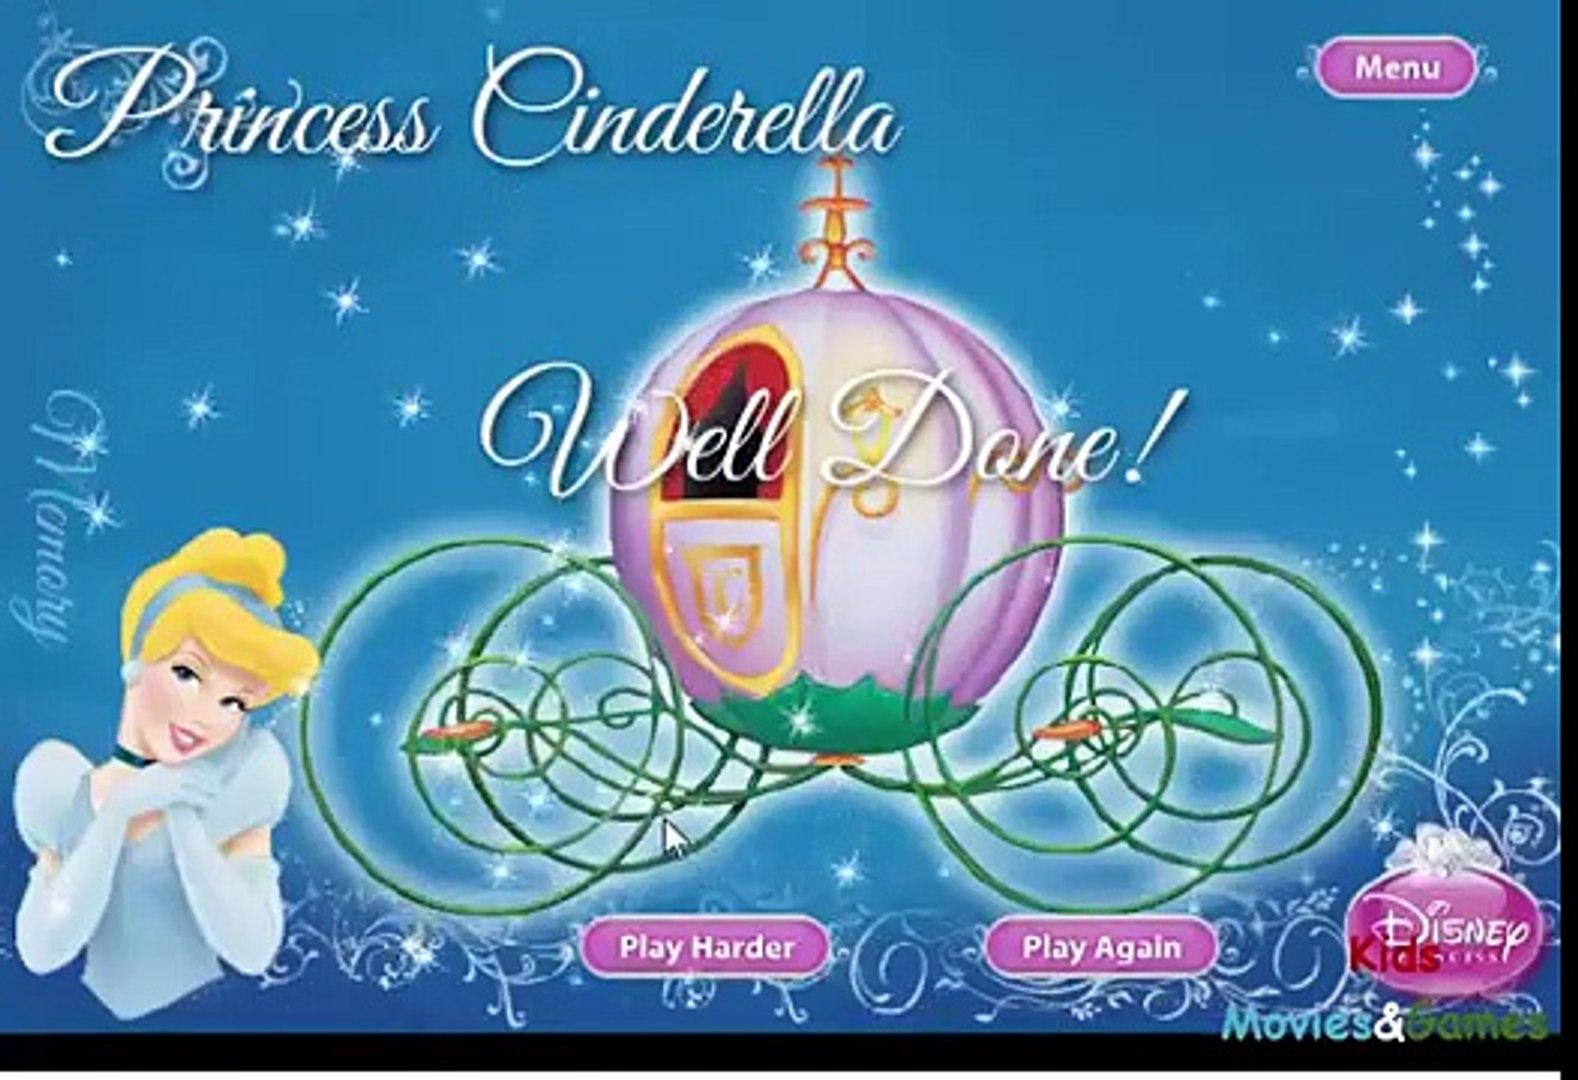 Disney Princess Cinderella Play Free Fun Games Movies Education For Kids